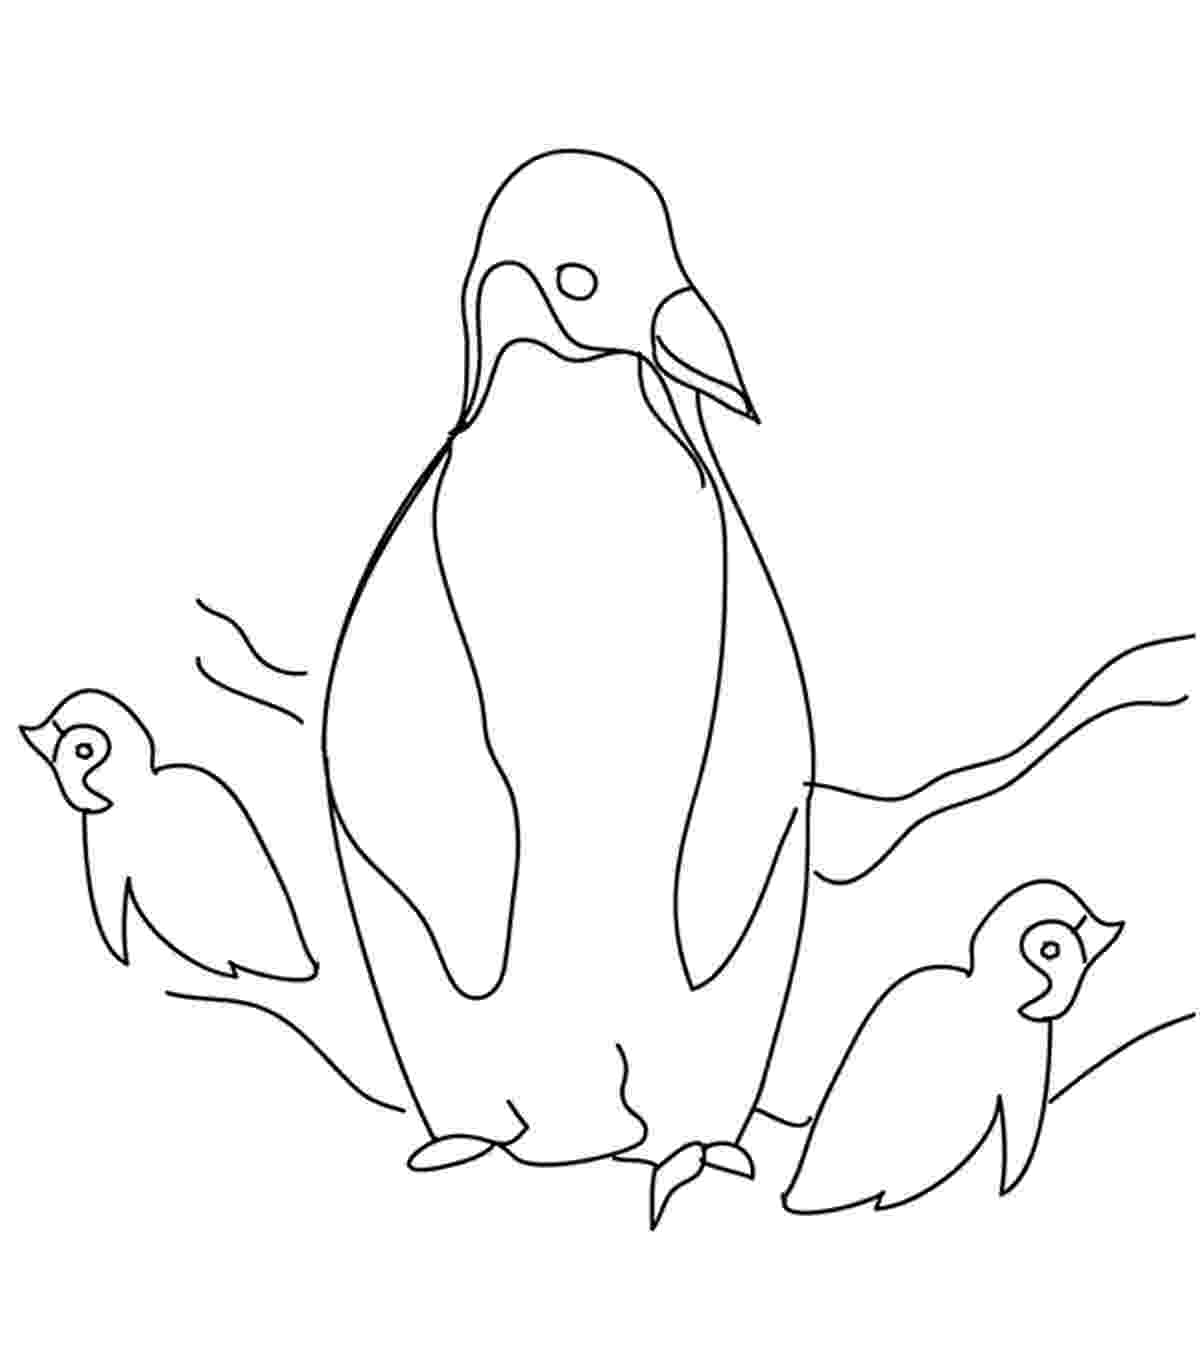 penguin color sheet penguin template animal templates free premium templates sheet penguin color